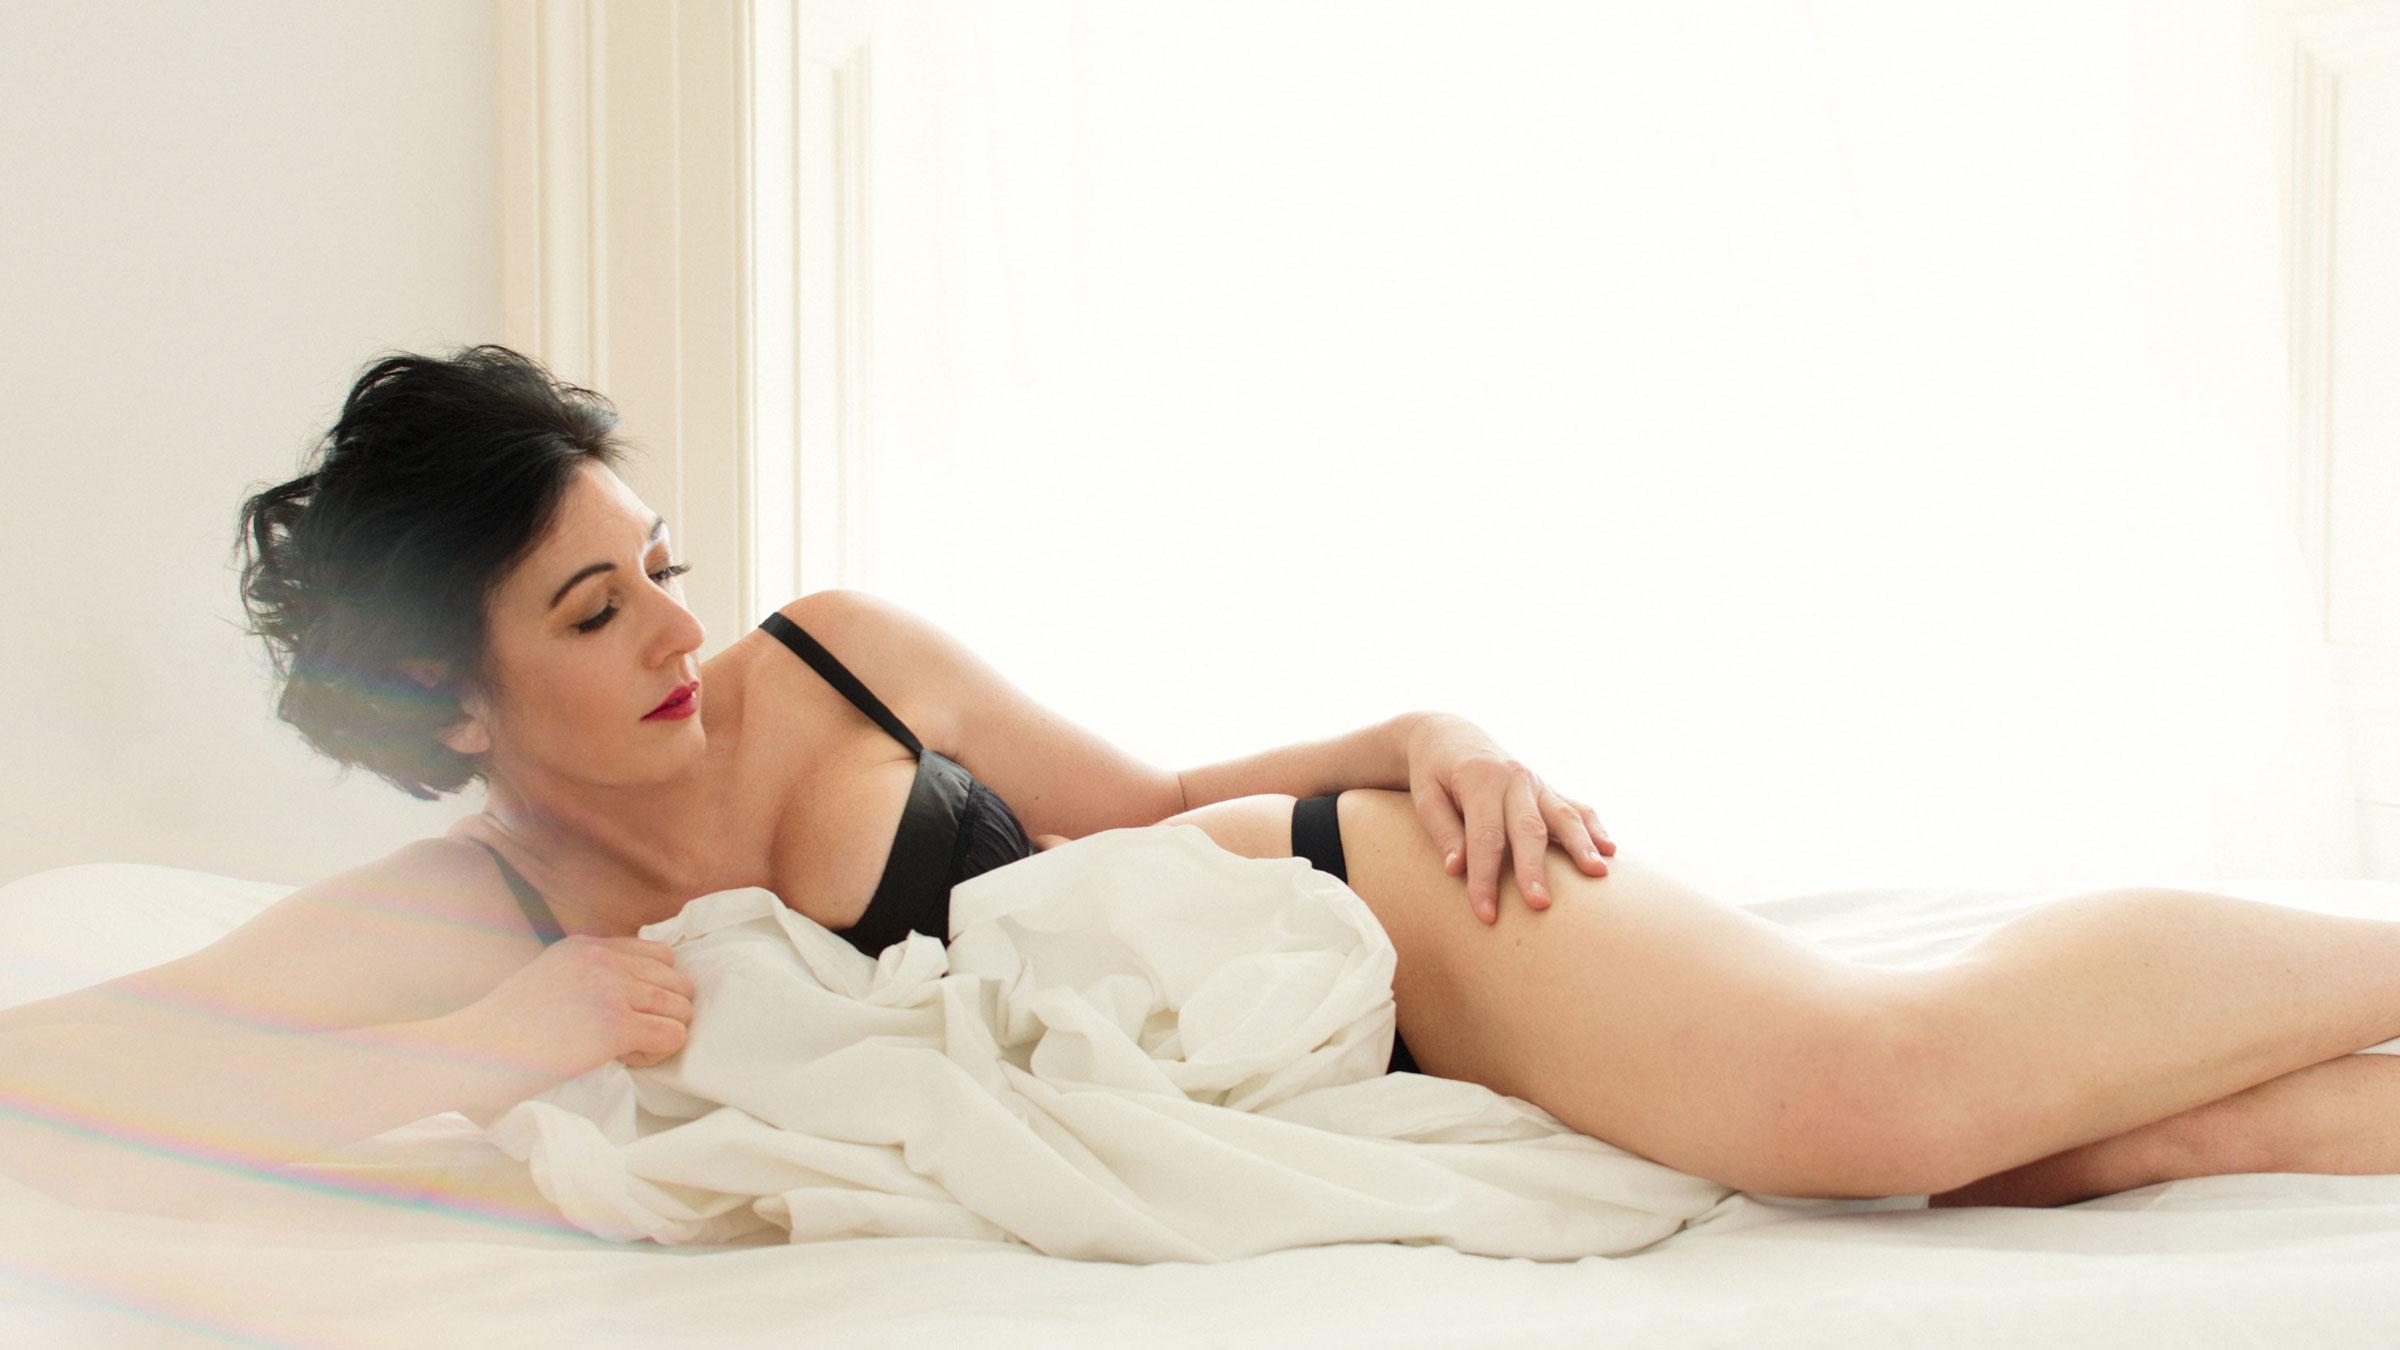 charlotte-kensington-portraits-ultimate-makeover-11.jpg